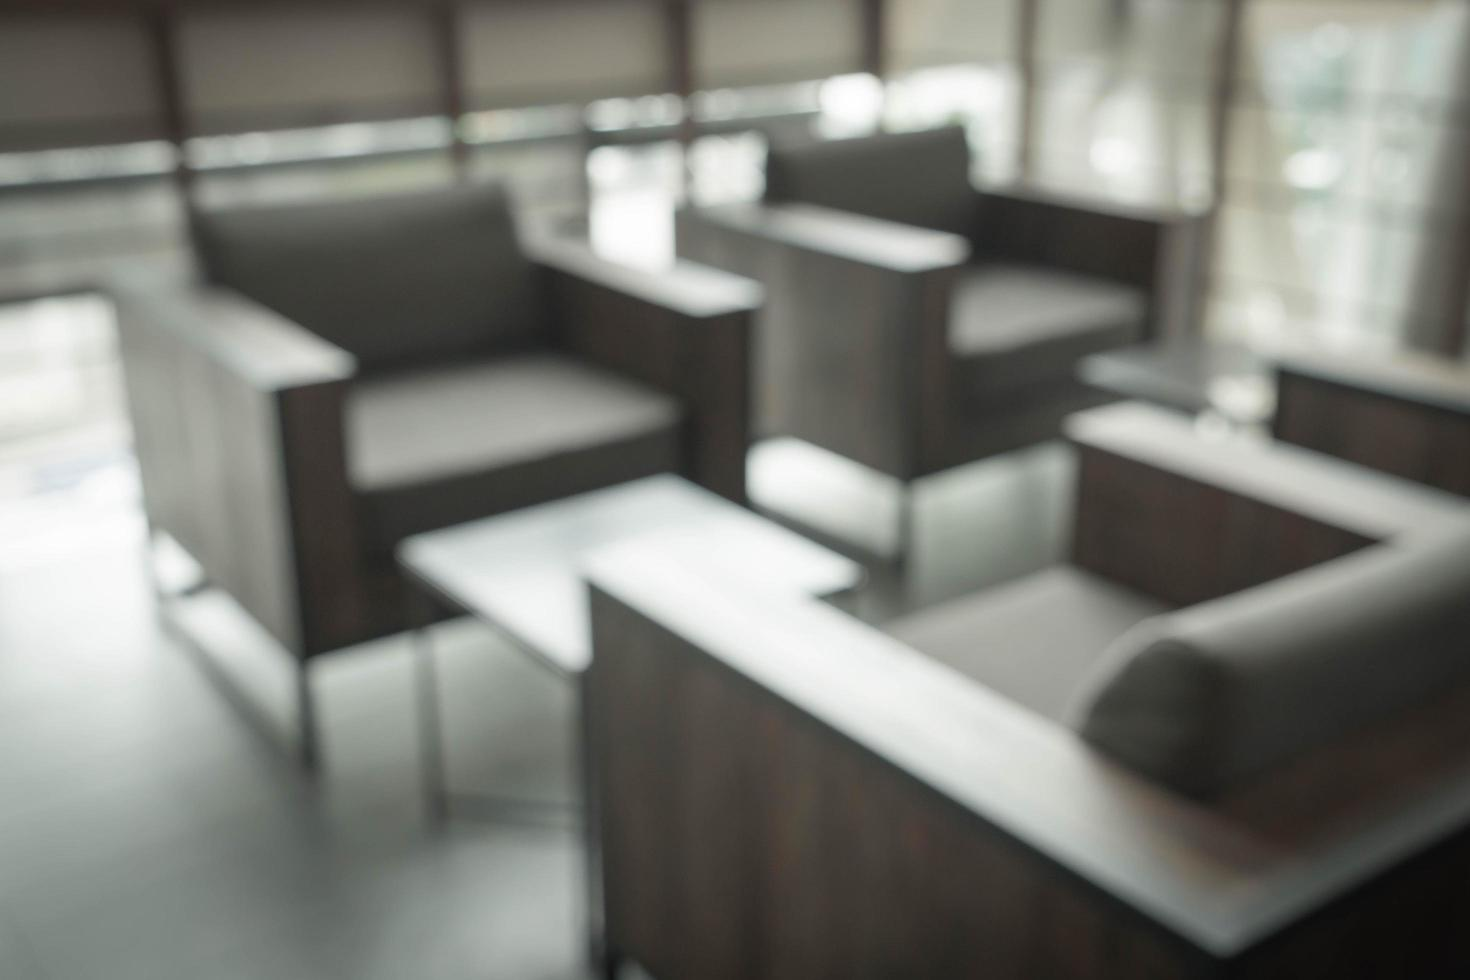 abstracte vervaging in coffeeshop - vintage effectfilter foto